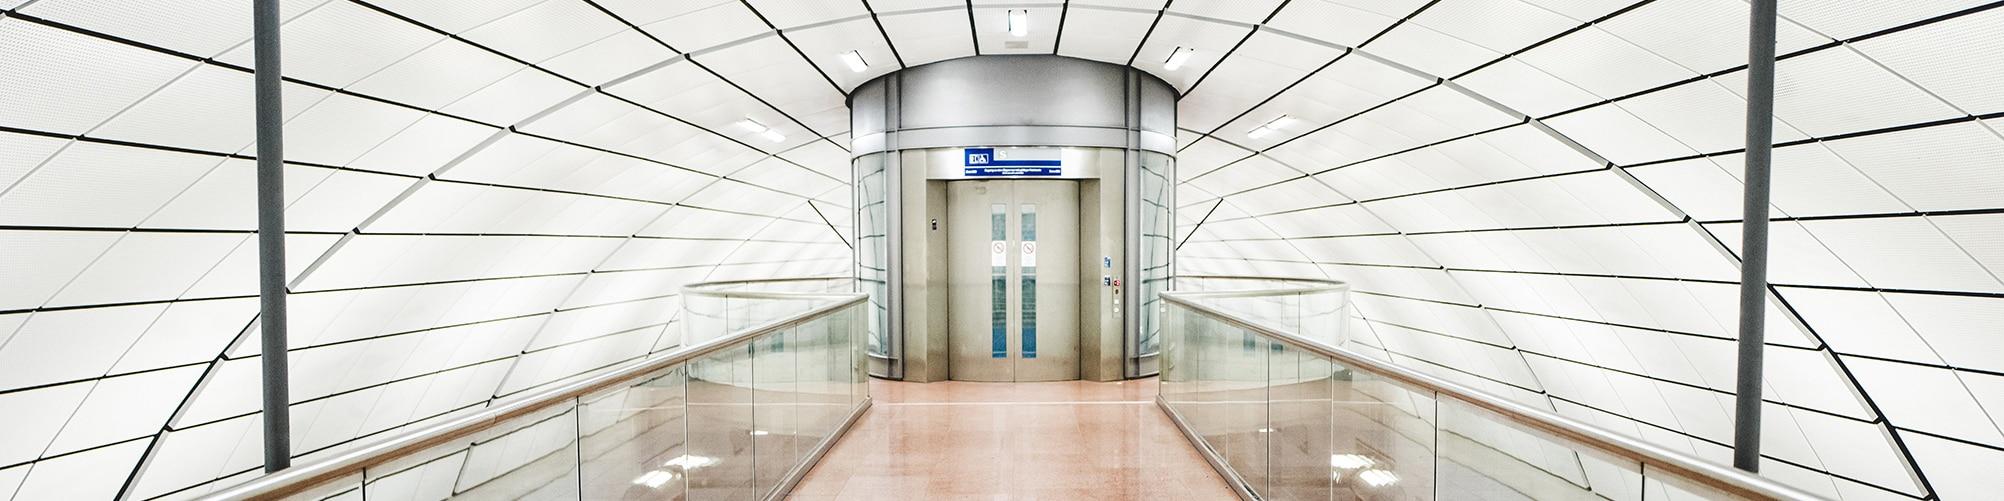 Airport Fahrstuhl